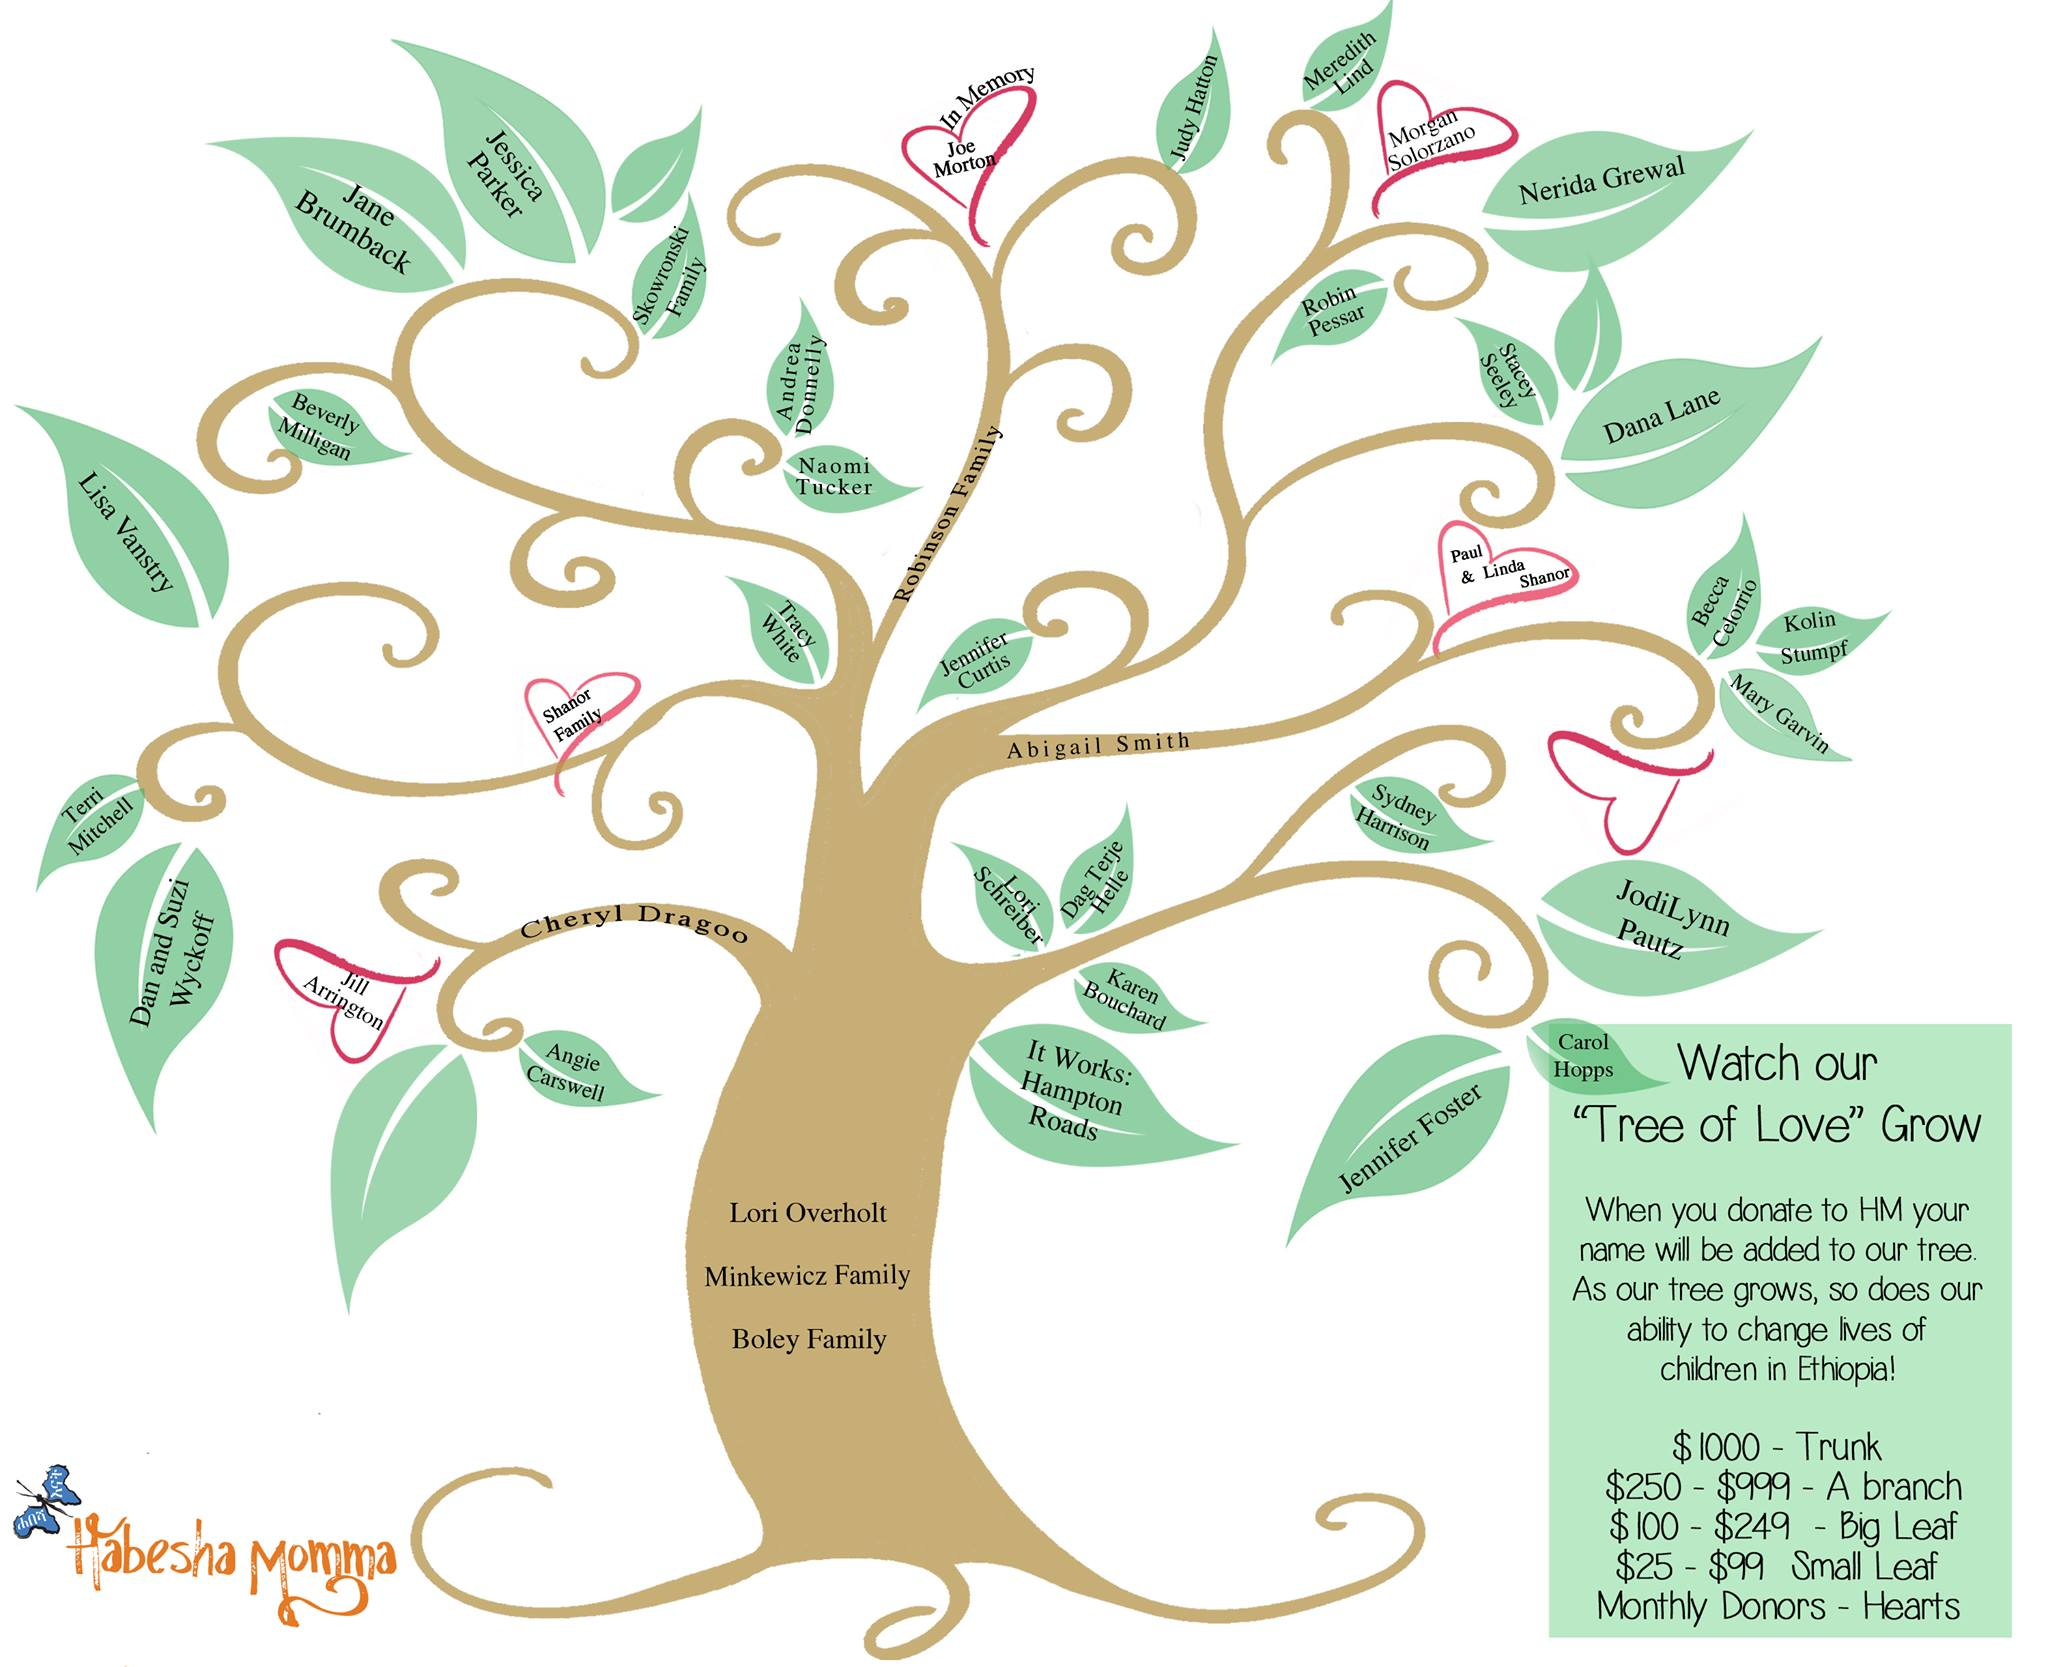 August 19 Tree of Love Progress